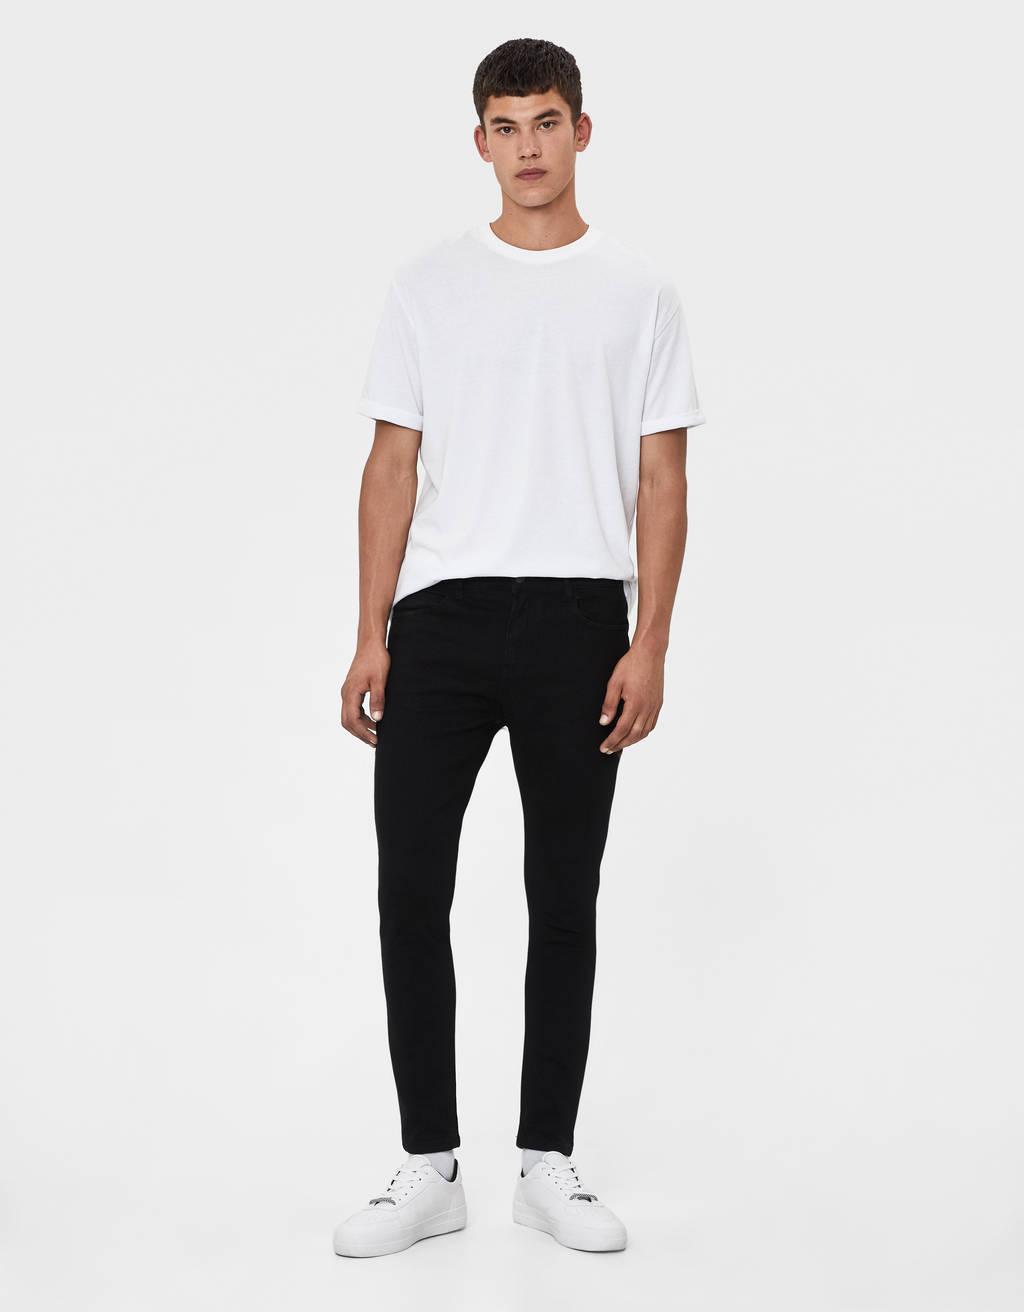 Jeans Super Skinny Fit